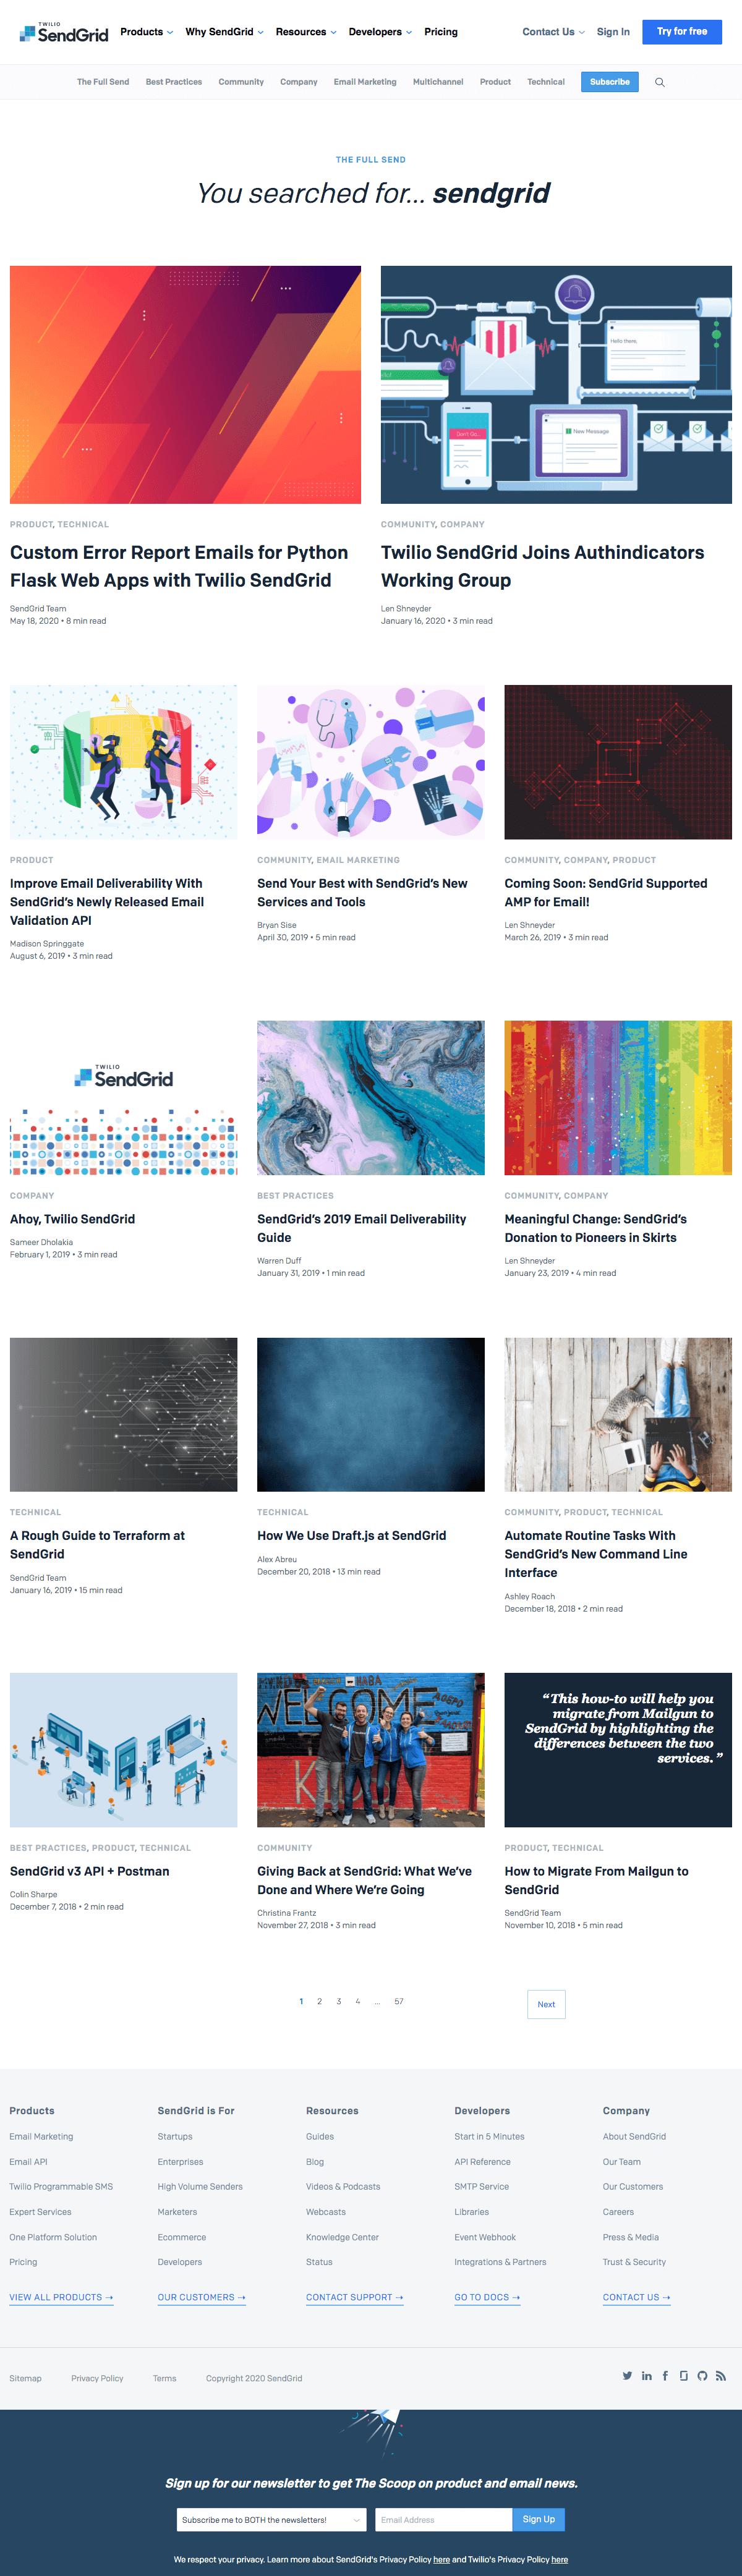 SendGrid - Search results page